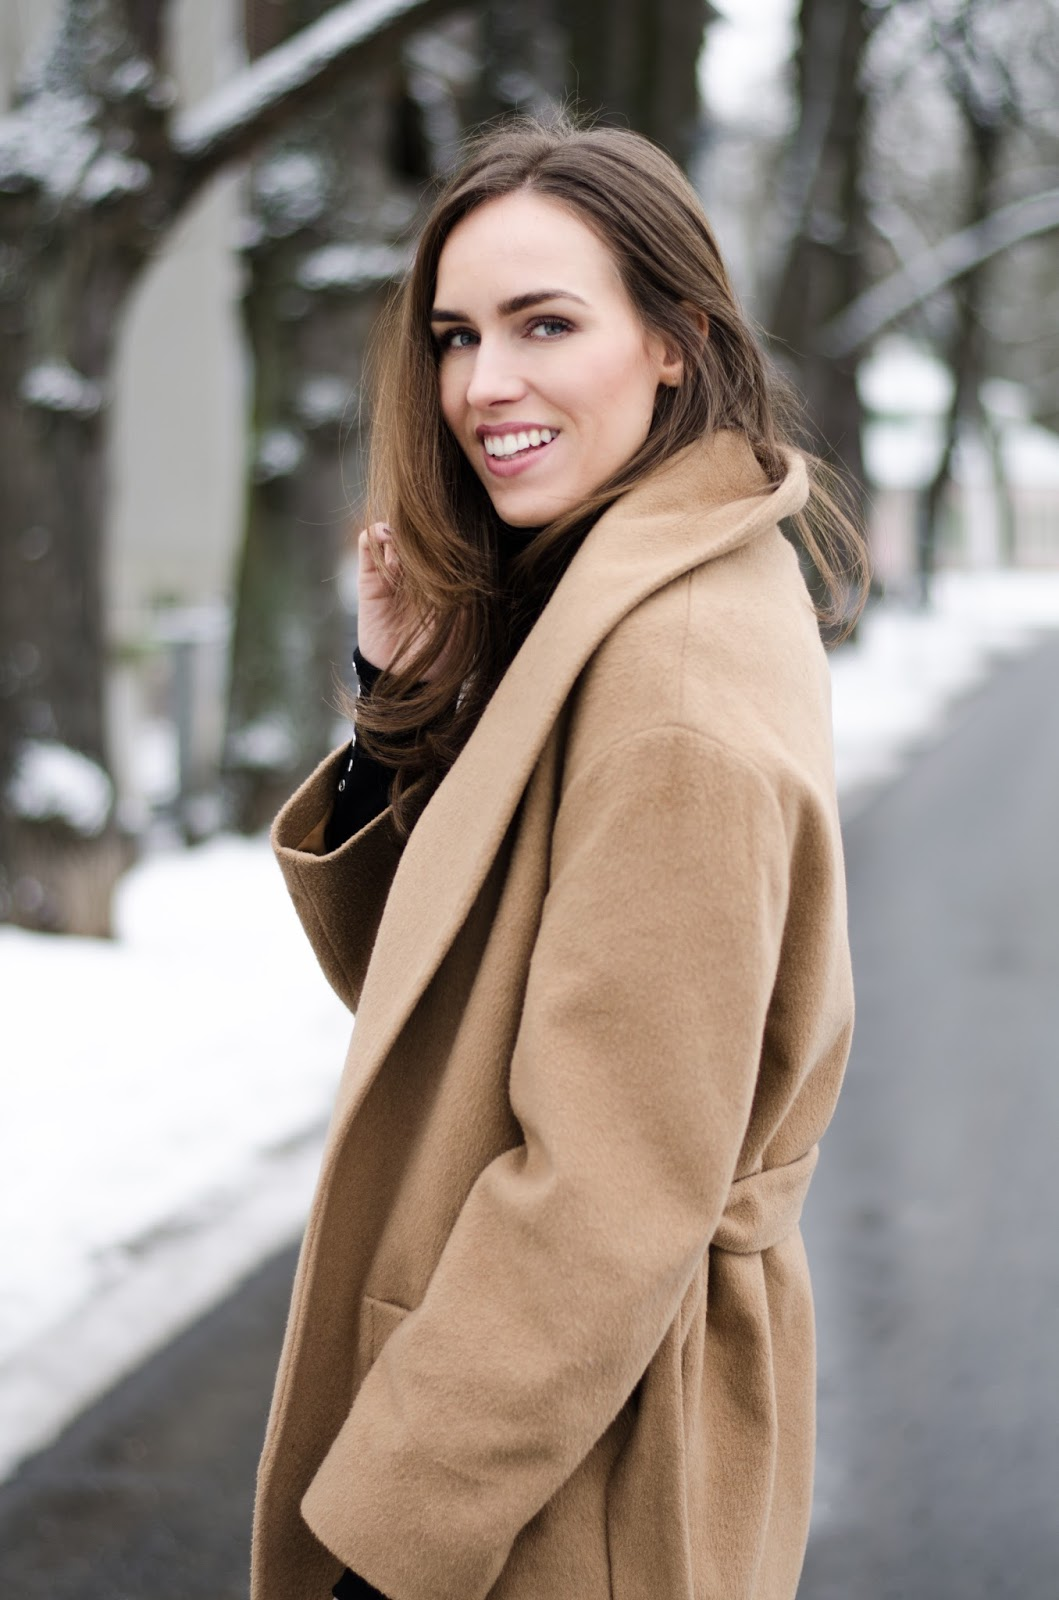 kristjaana mere camel coat outfit